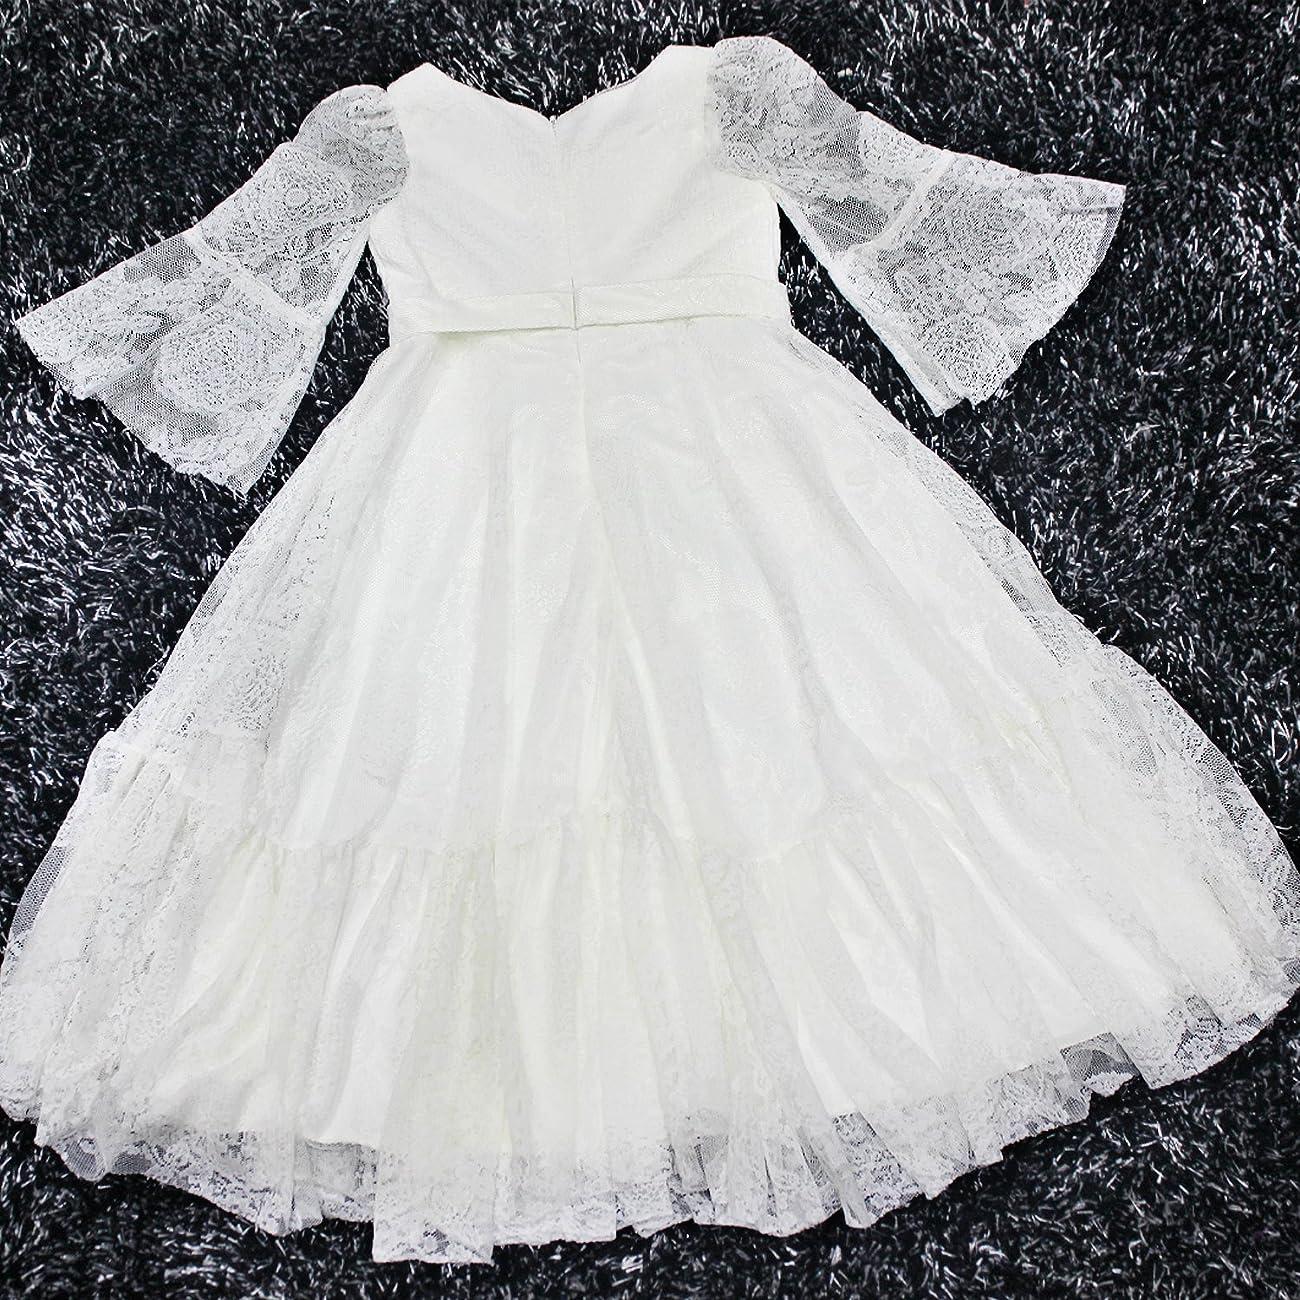 Fancy A-line Lace Flower Girl Dress 2-12 Year Old 4